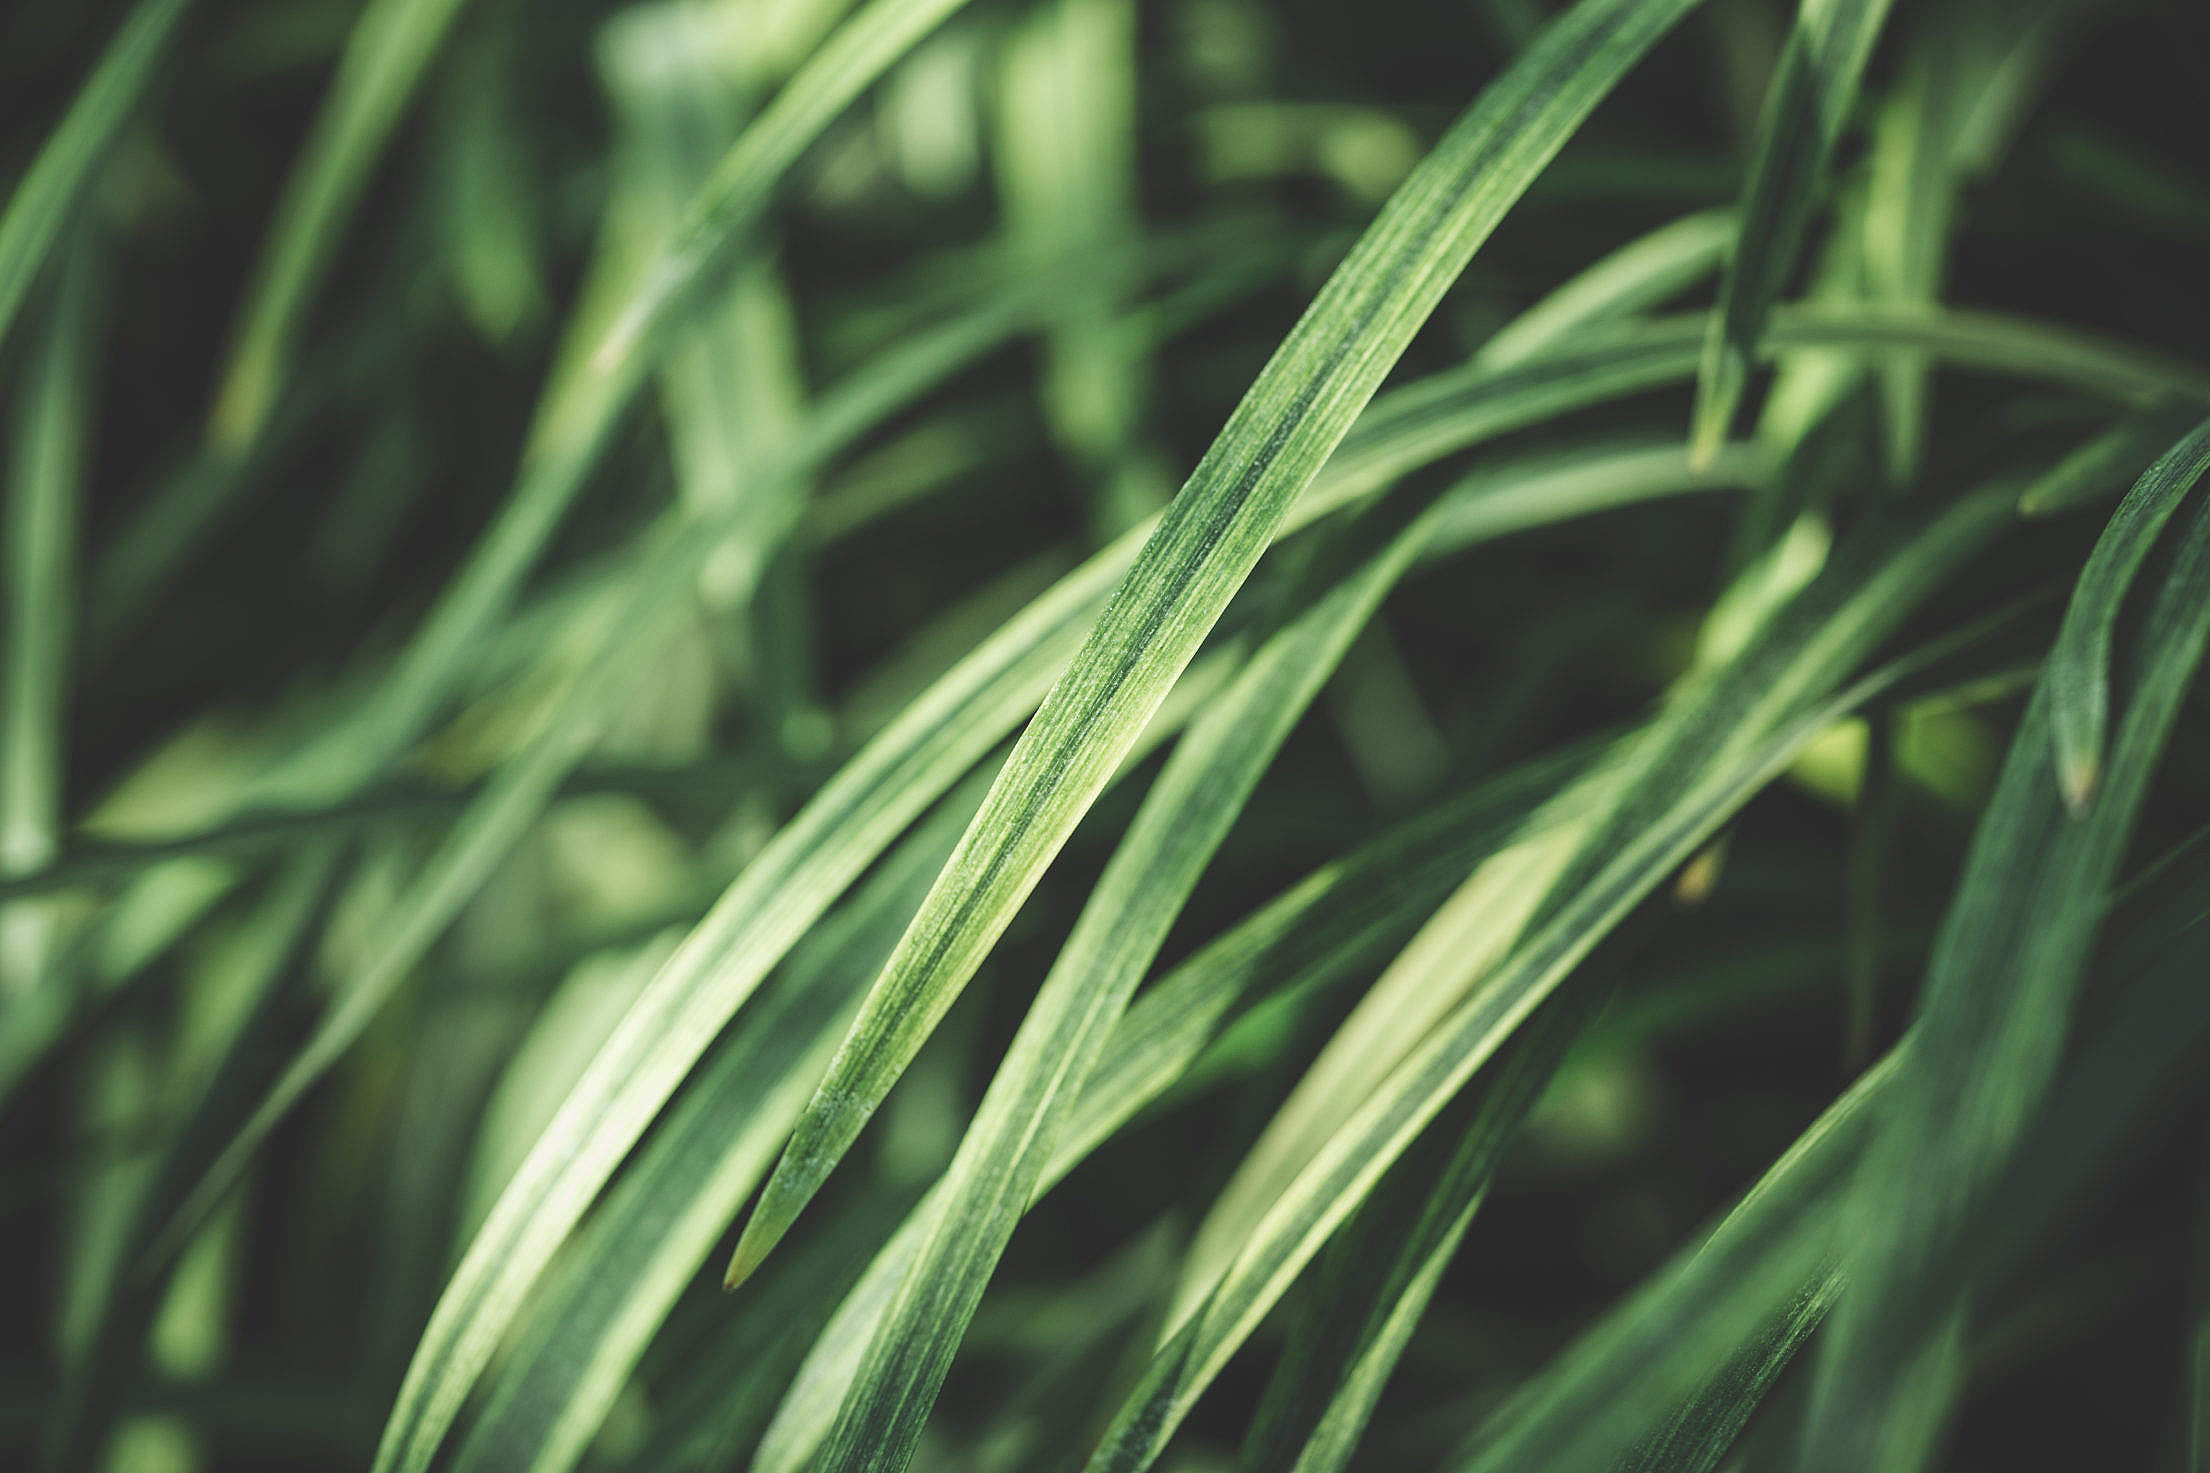 Grass Stems Close Up Free Stock Photo